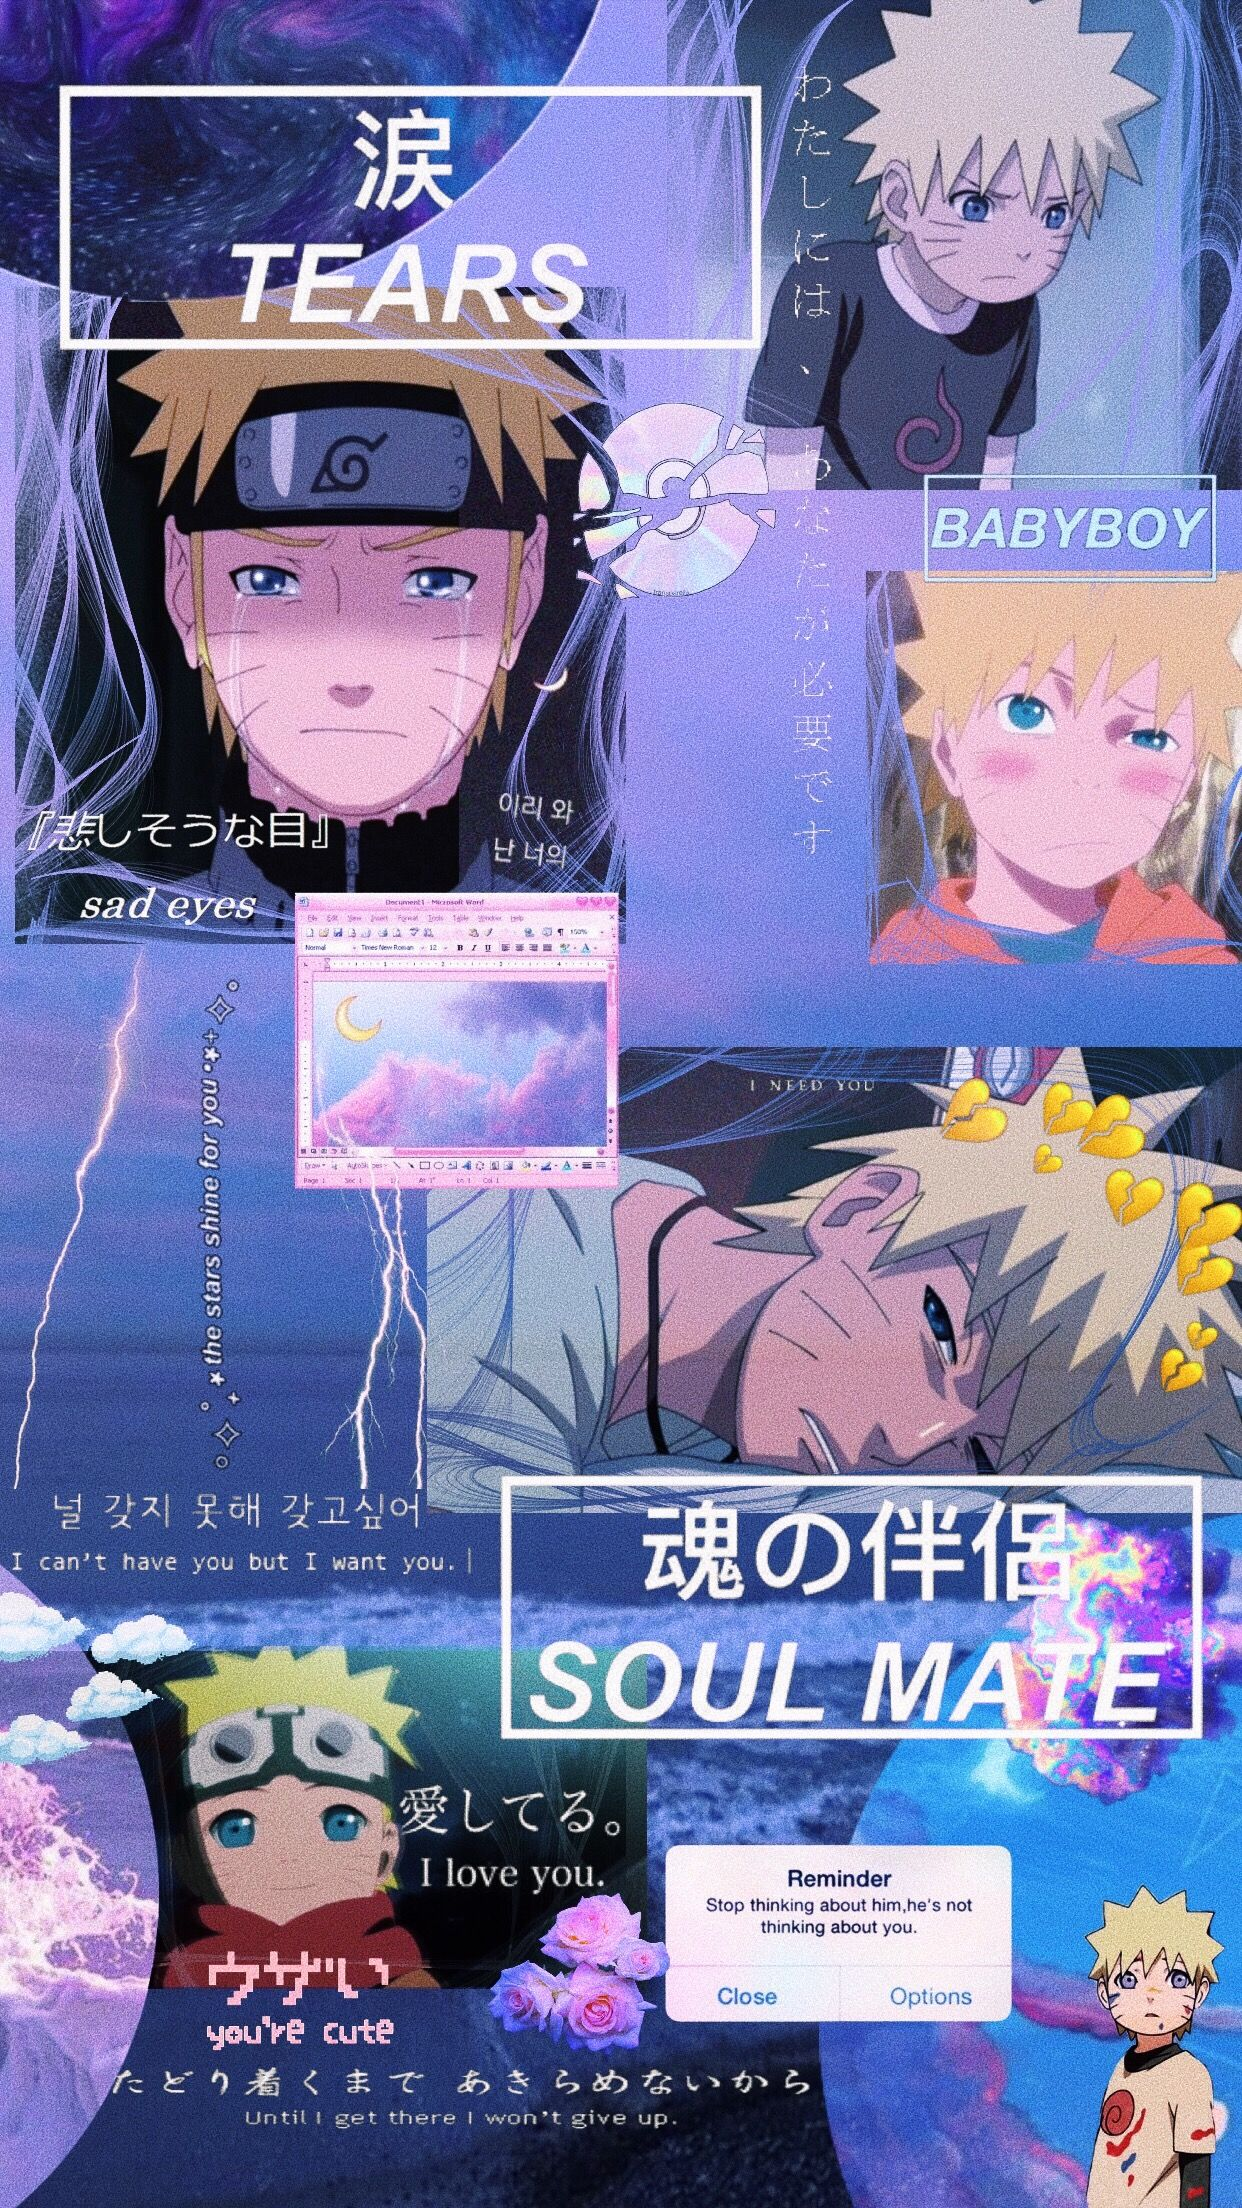 naruto anime narutoshippuden aesthetic edit